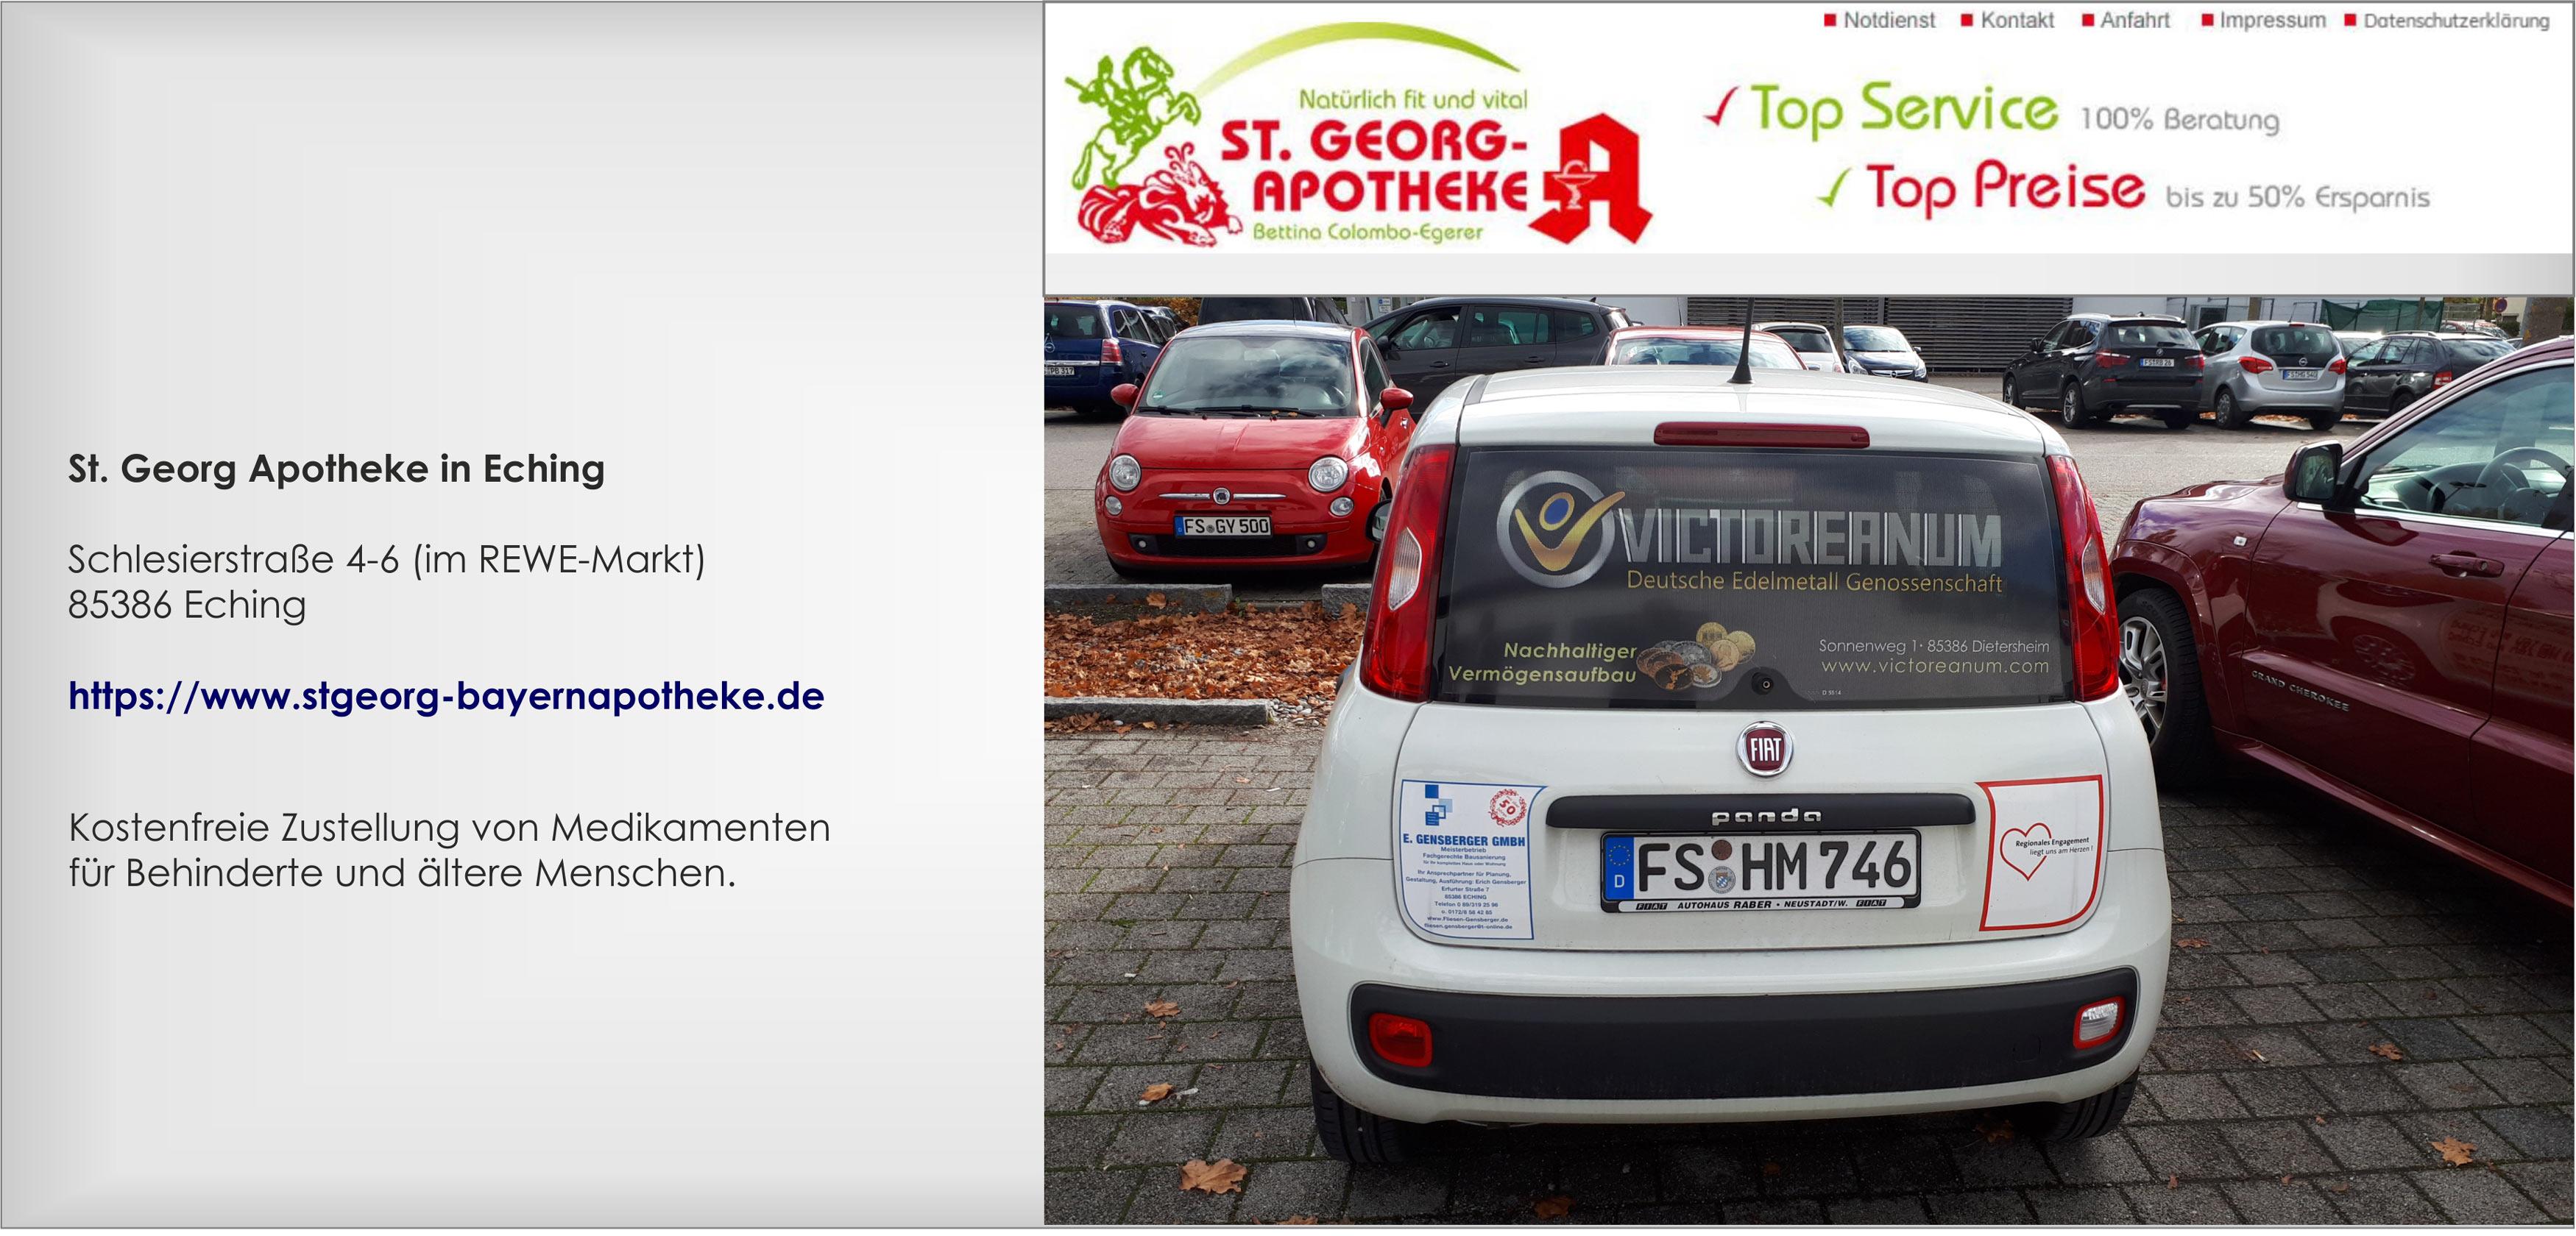 St.Georg Apotheke, Victoreanum-Sponsoring, Soziales Engagement, Apothekenauto